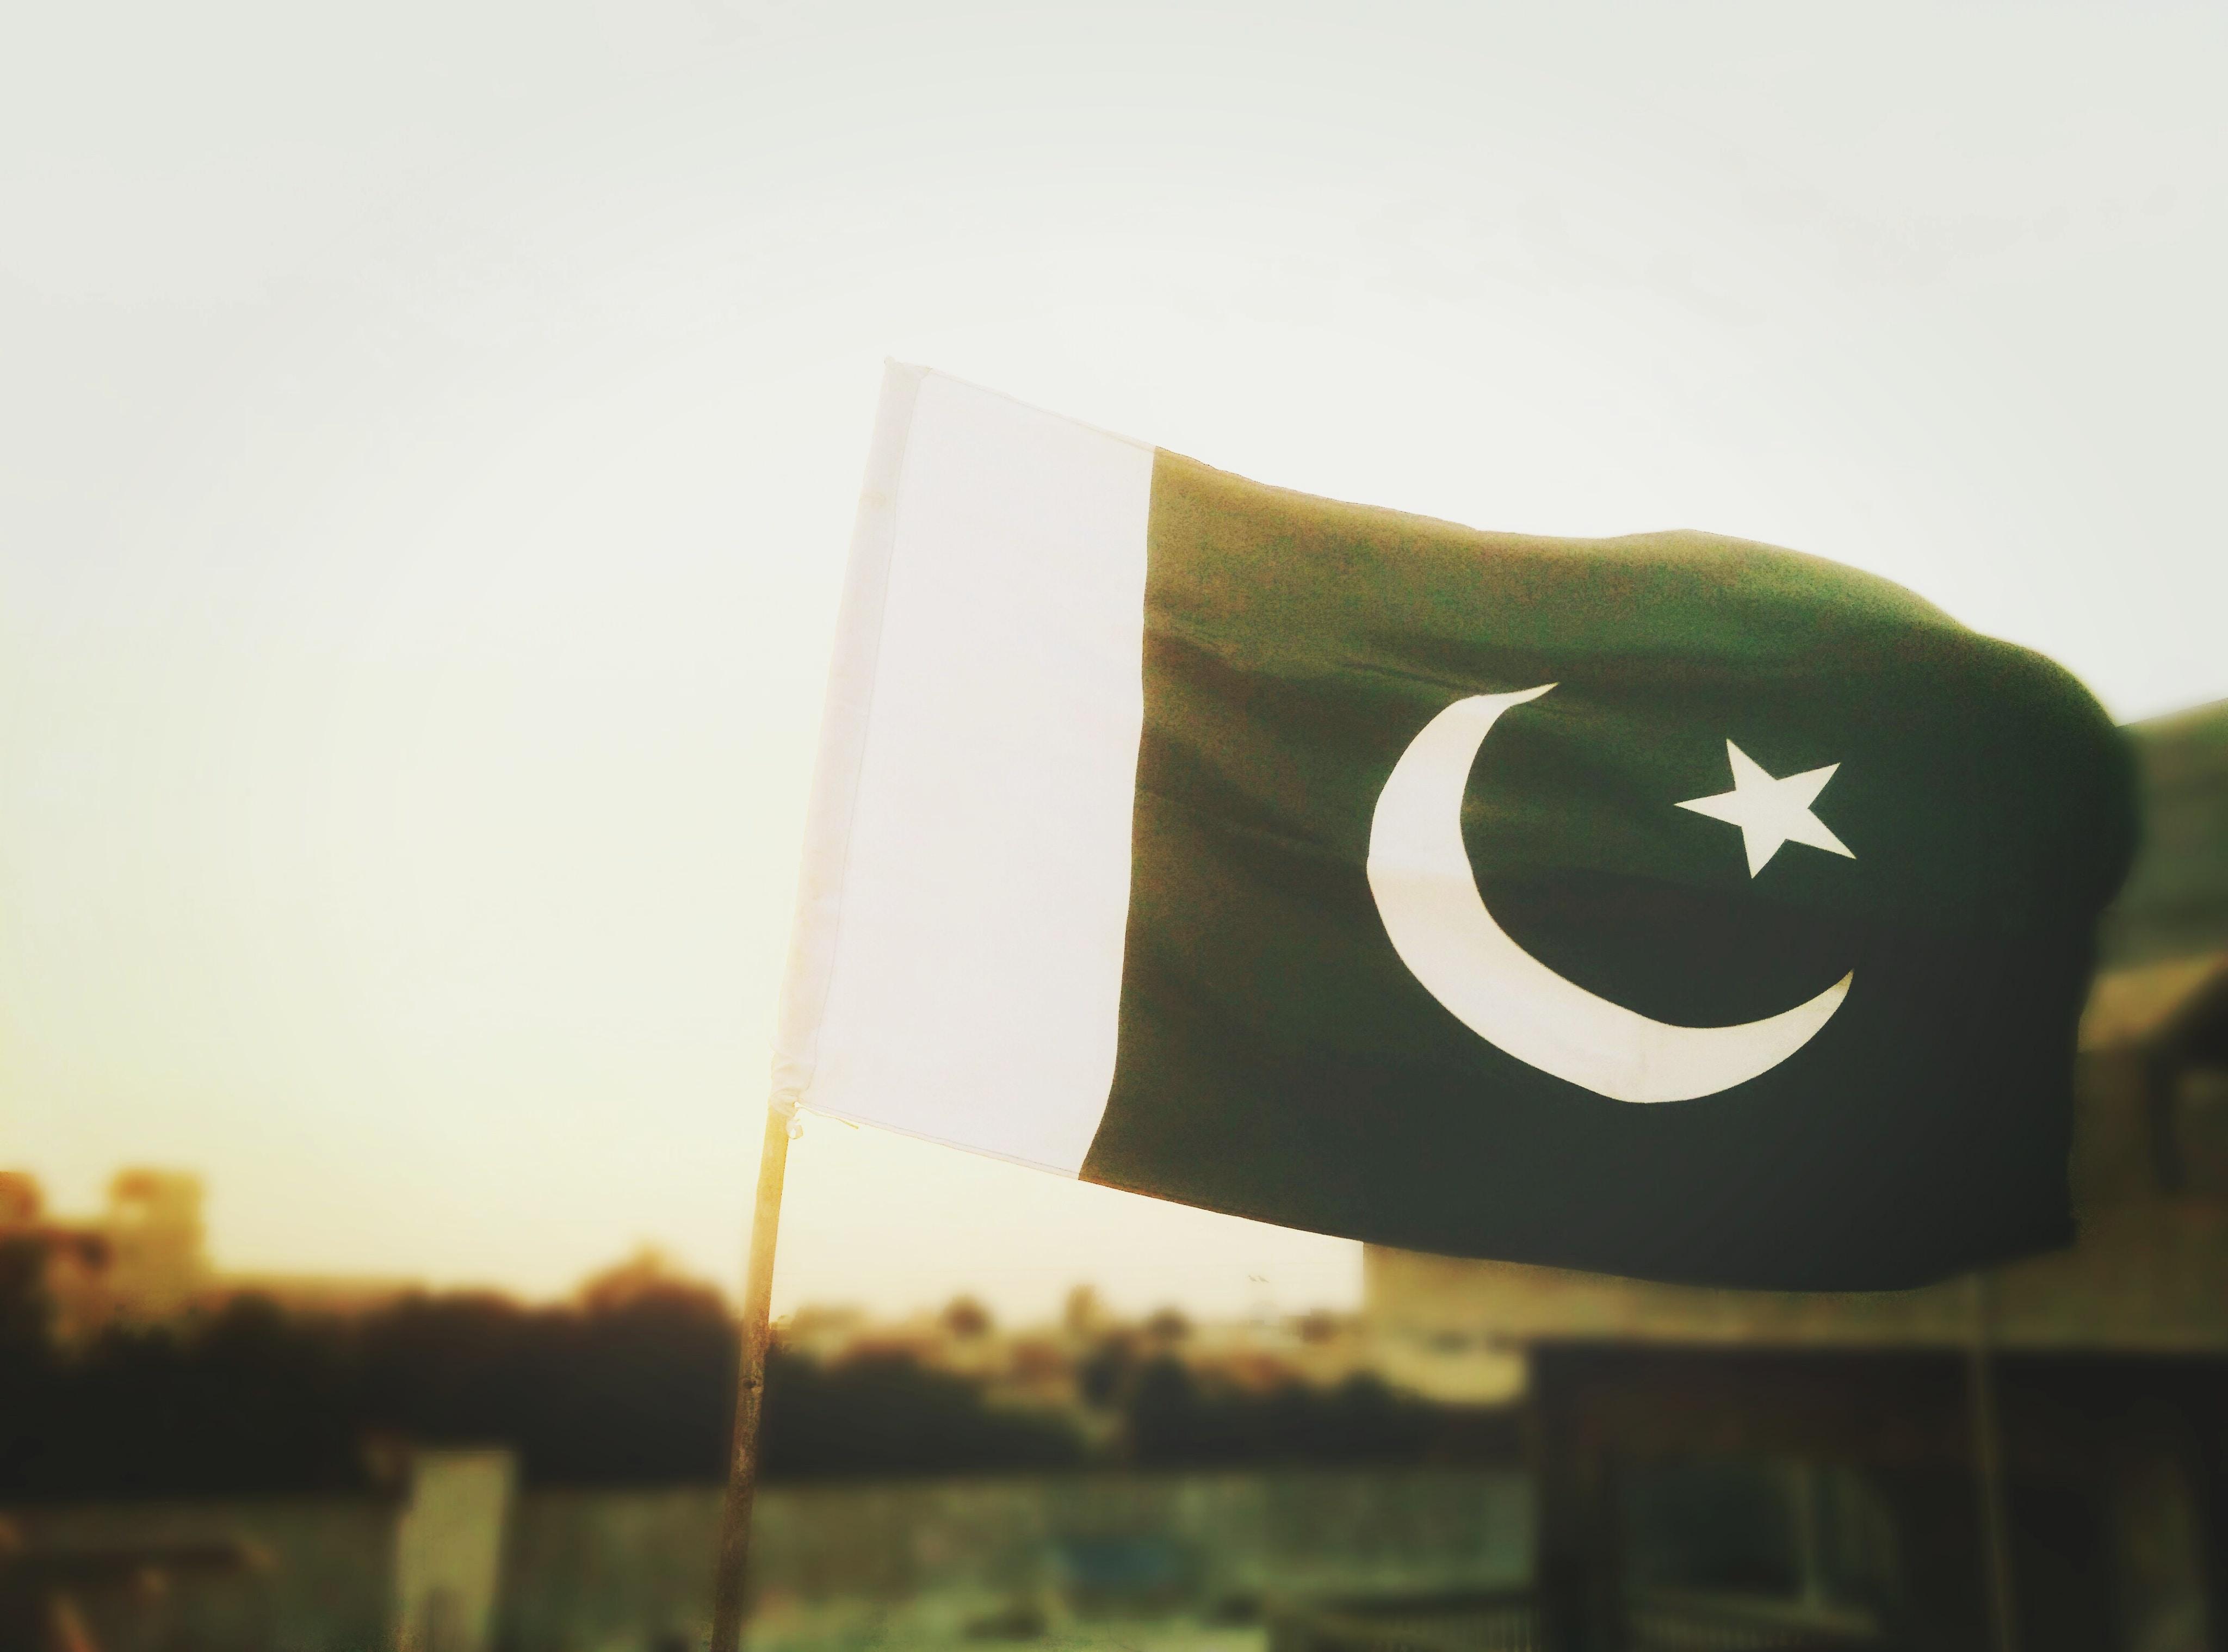 Pakistan: Ex-Präsident wegen Hochverrats zum Tode verurteilt